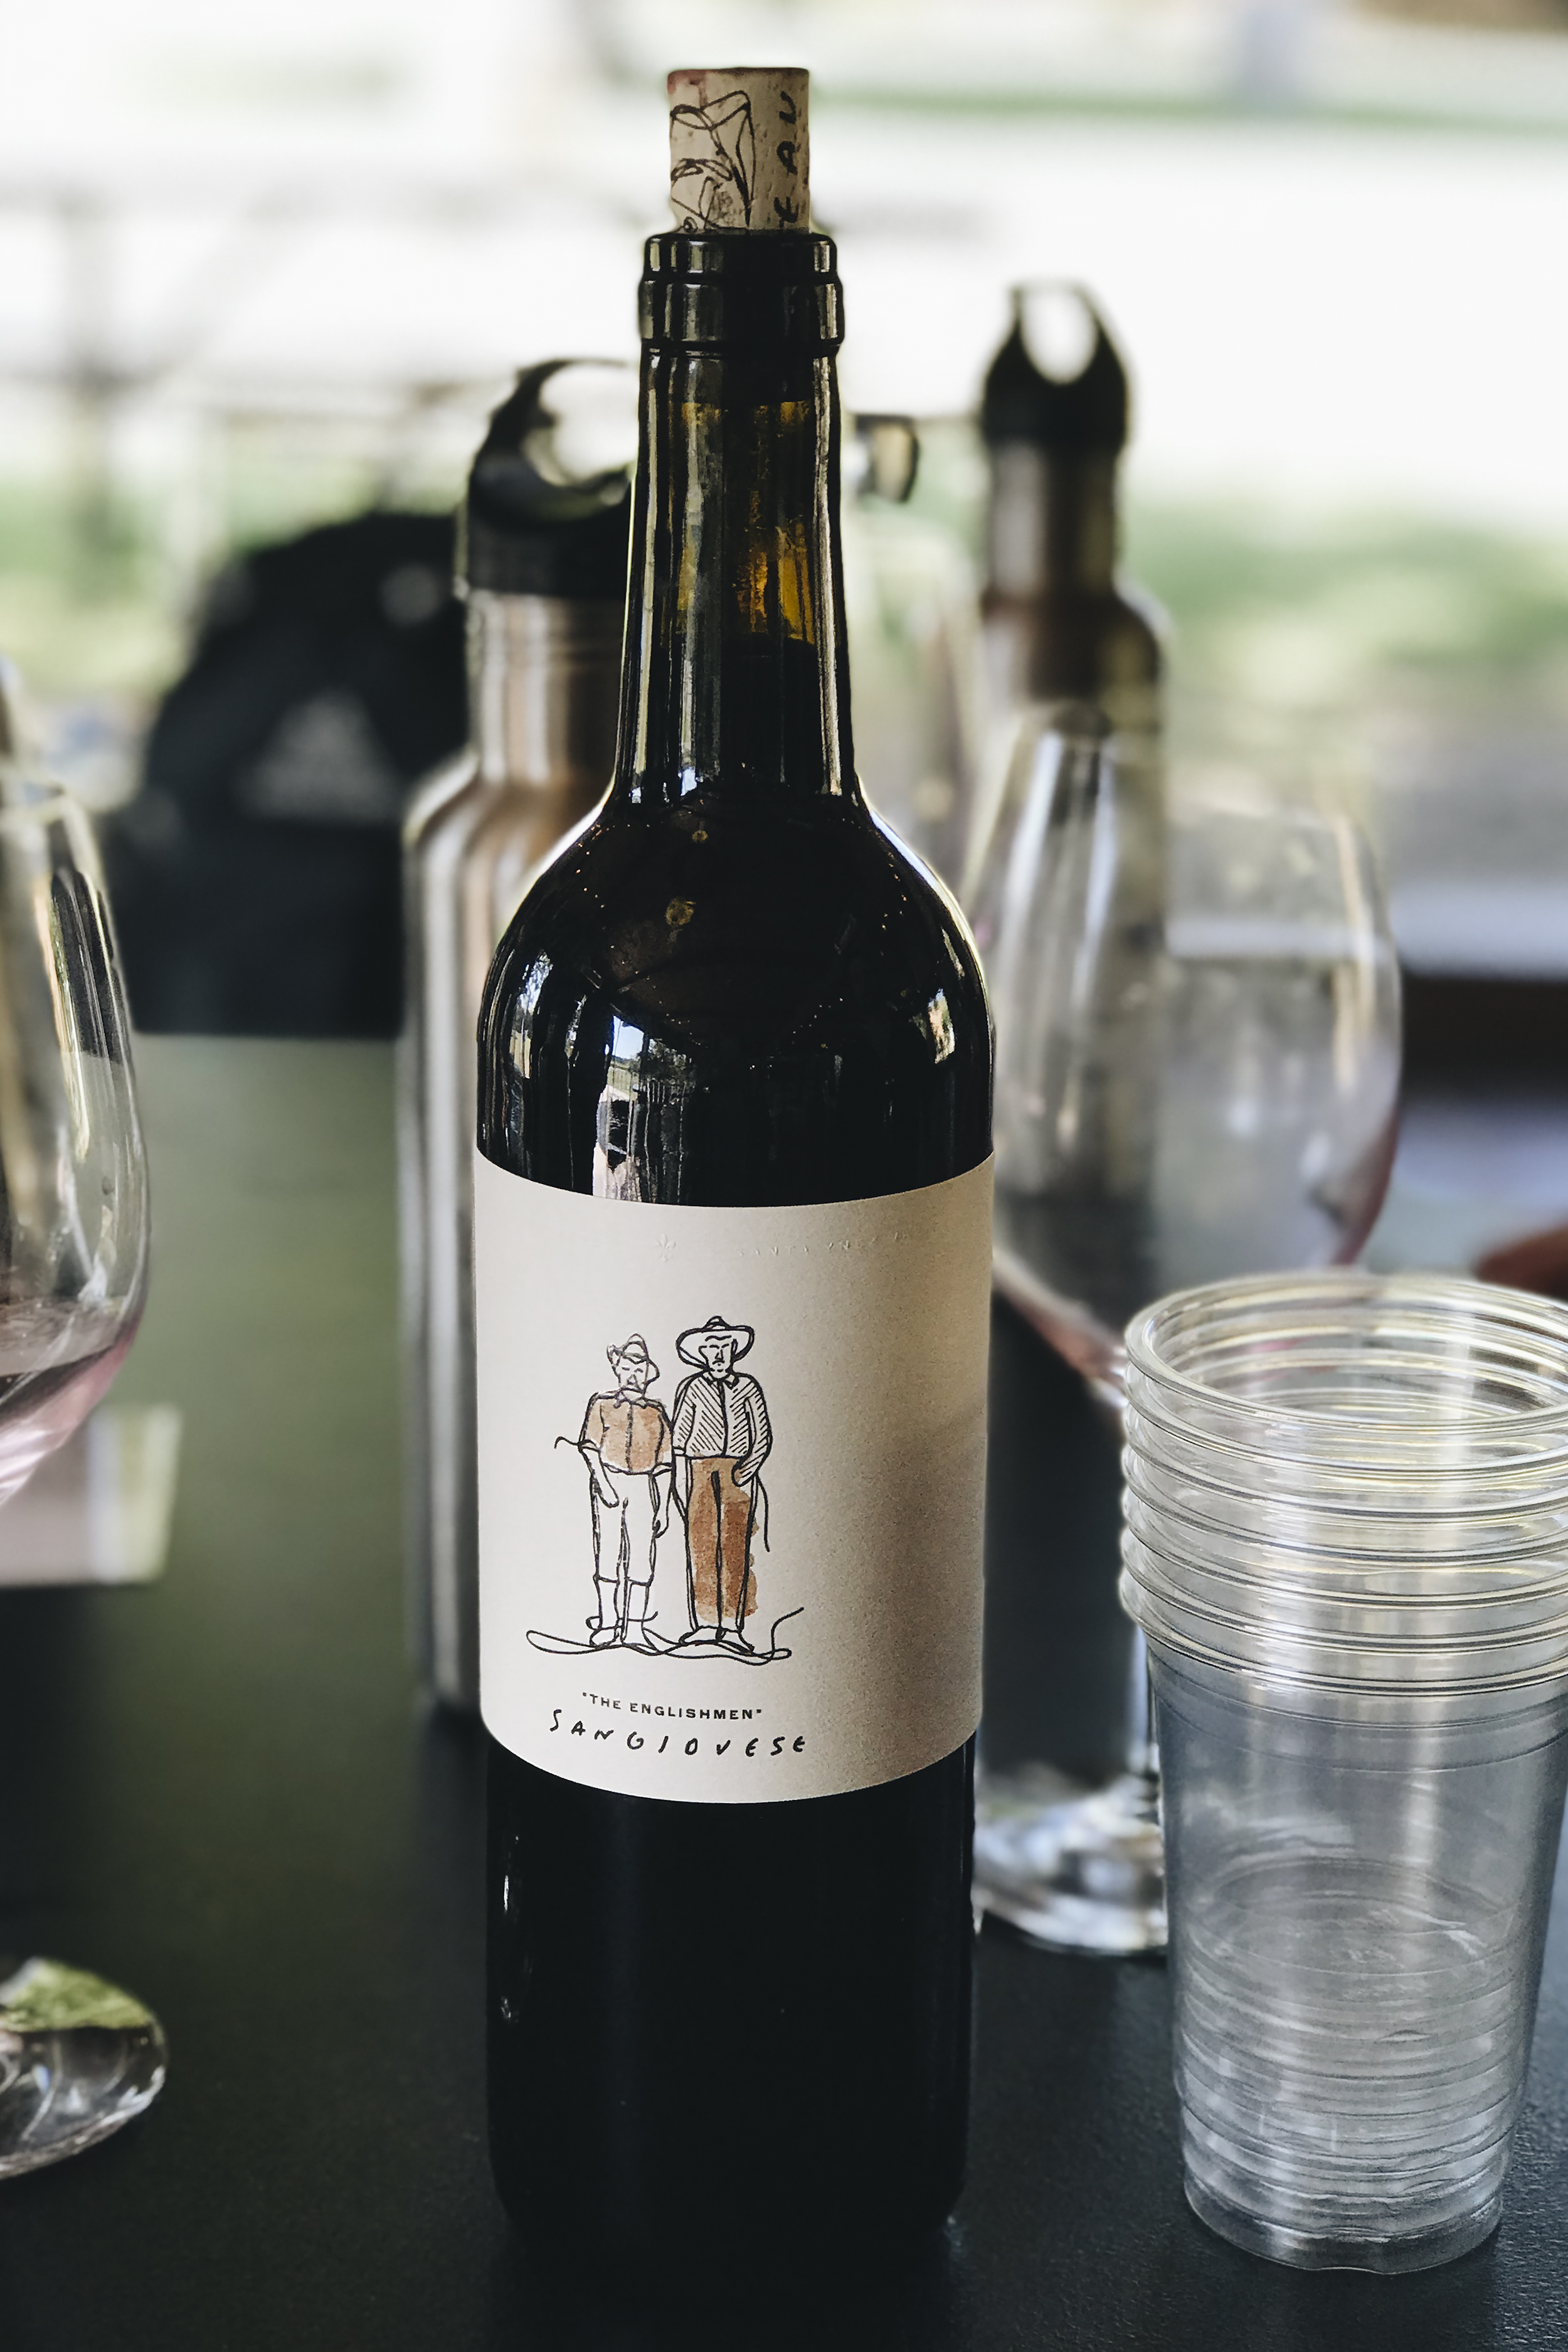 chrissihernandez-california-santaynez-rideau-winecopy2500.jpg